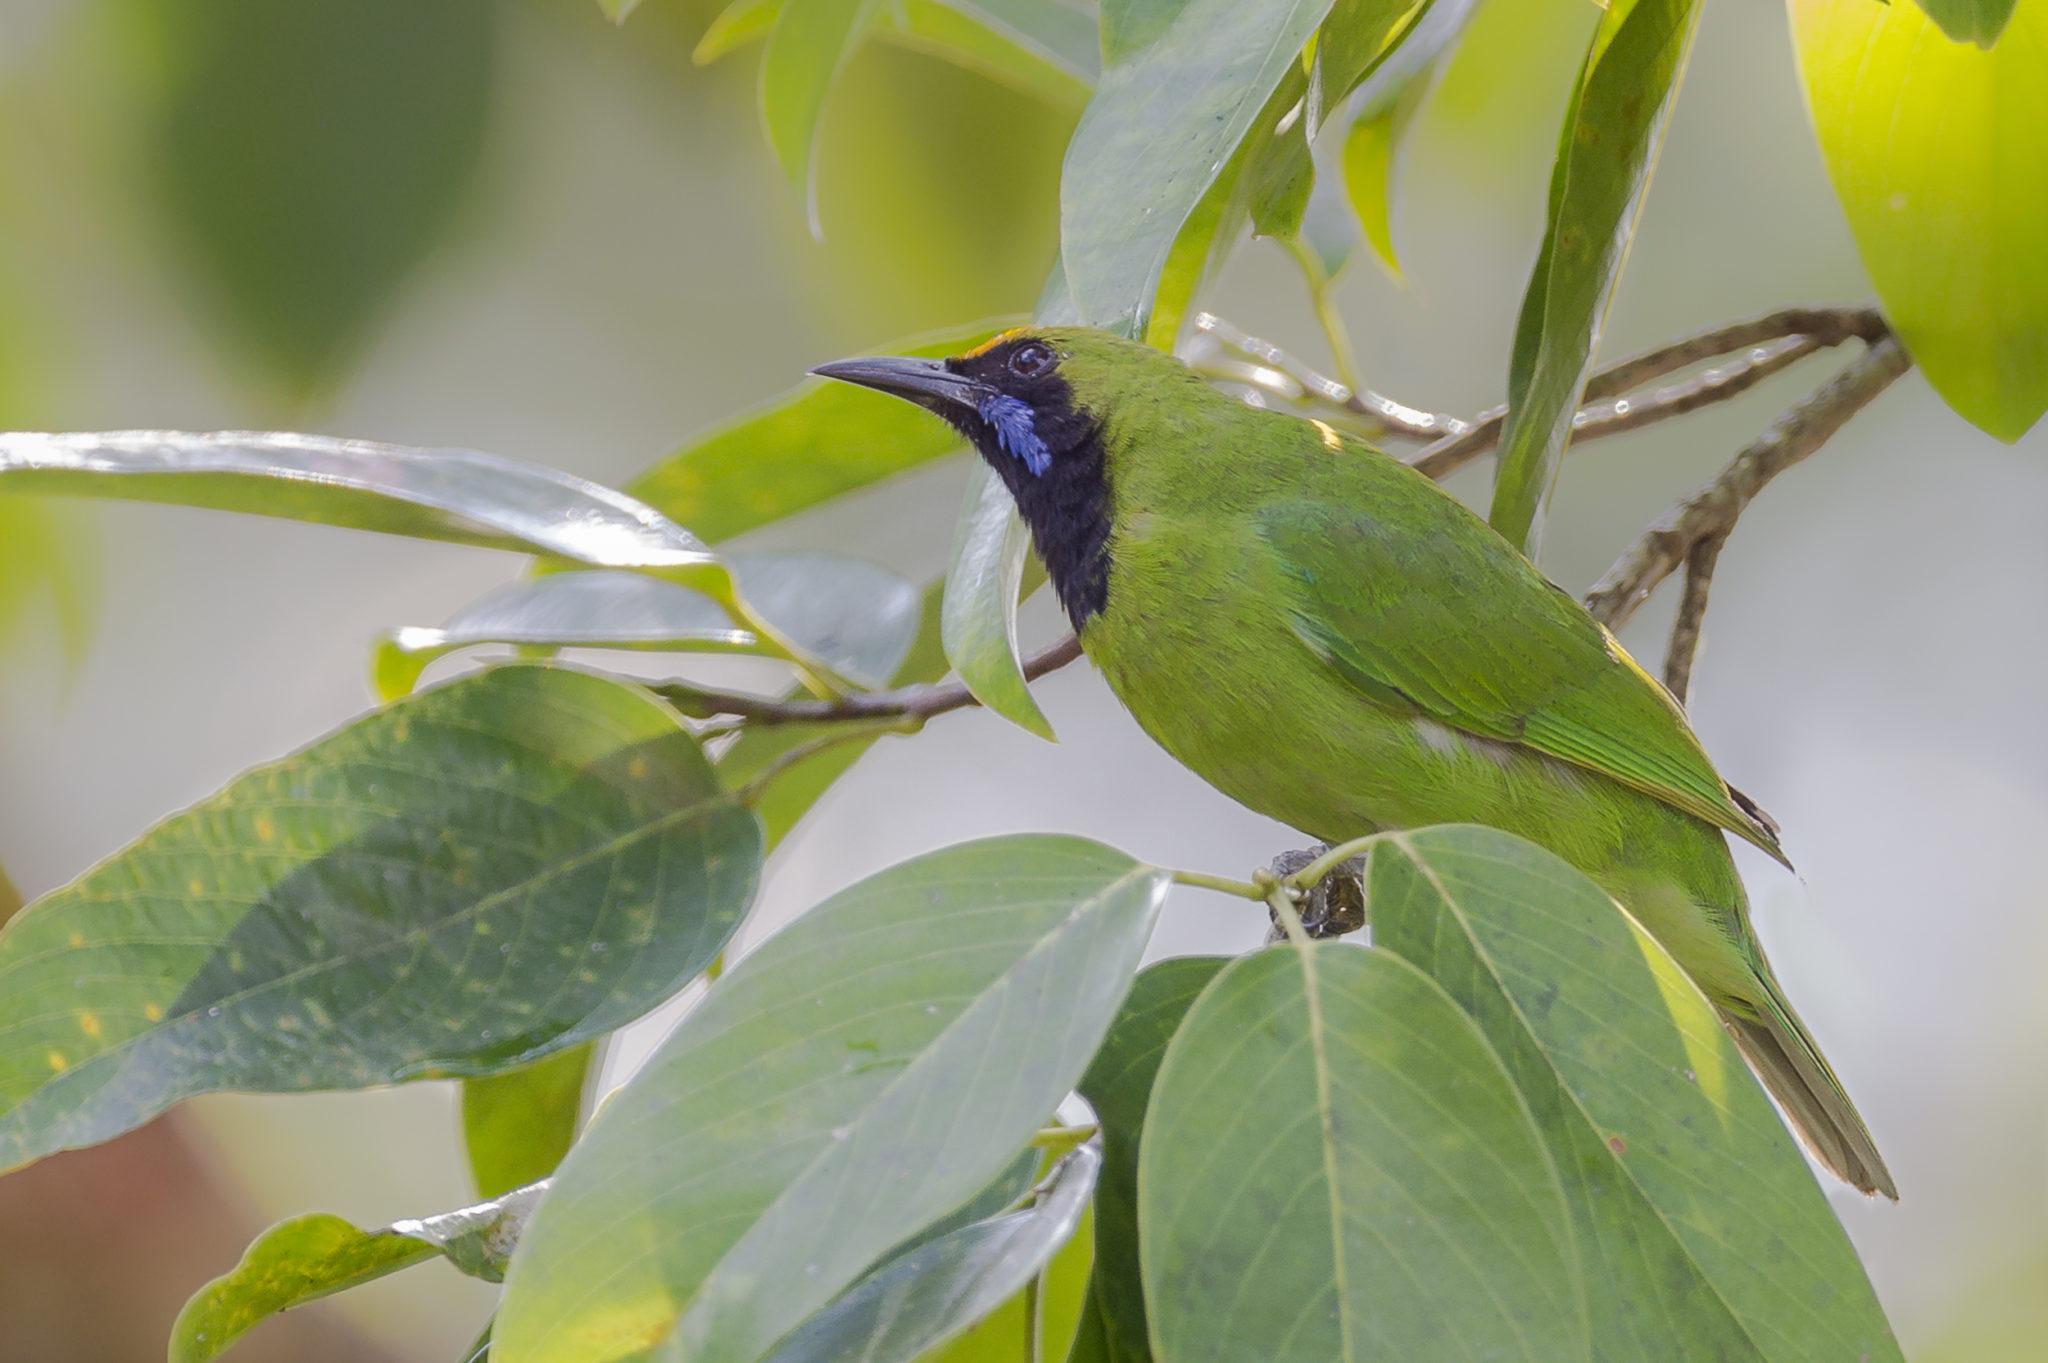 Golden-fronted Leafbird ( Chloropsis aurifrons ), endemische Art